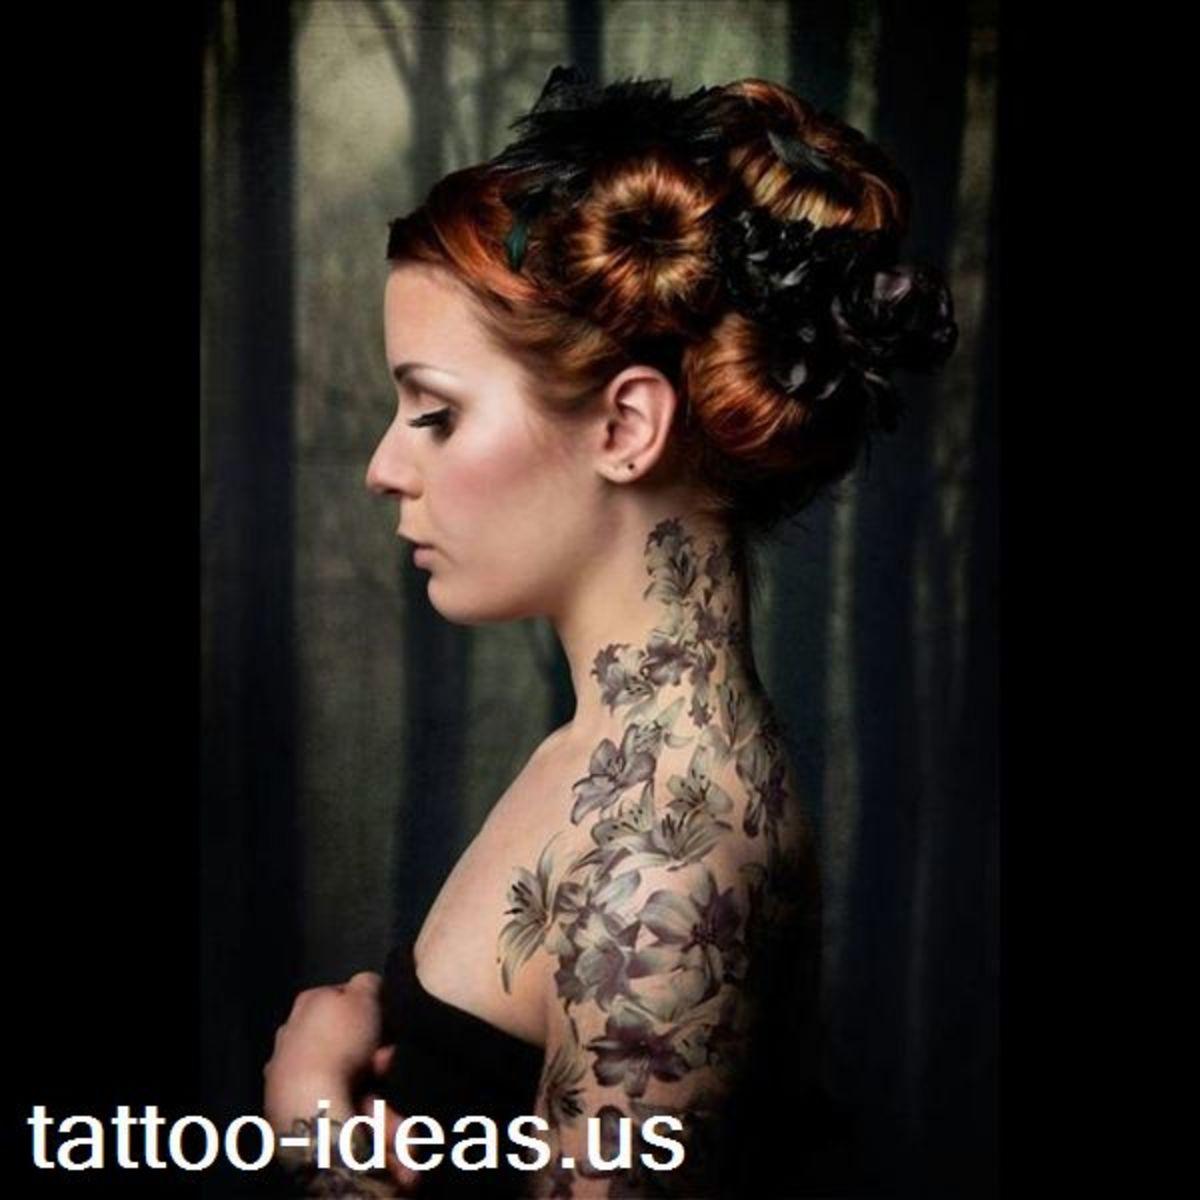 Beautiful shoulder tattoo of flowers